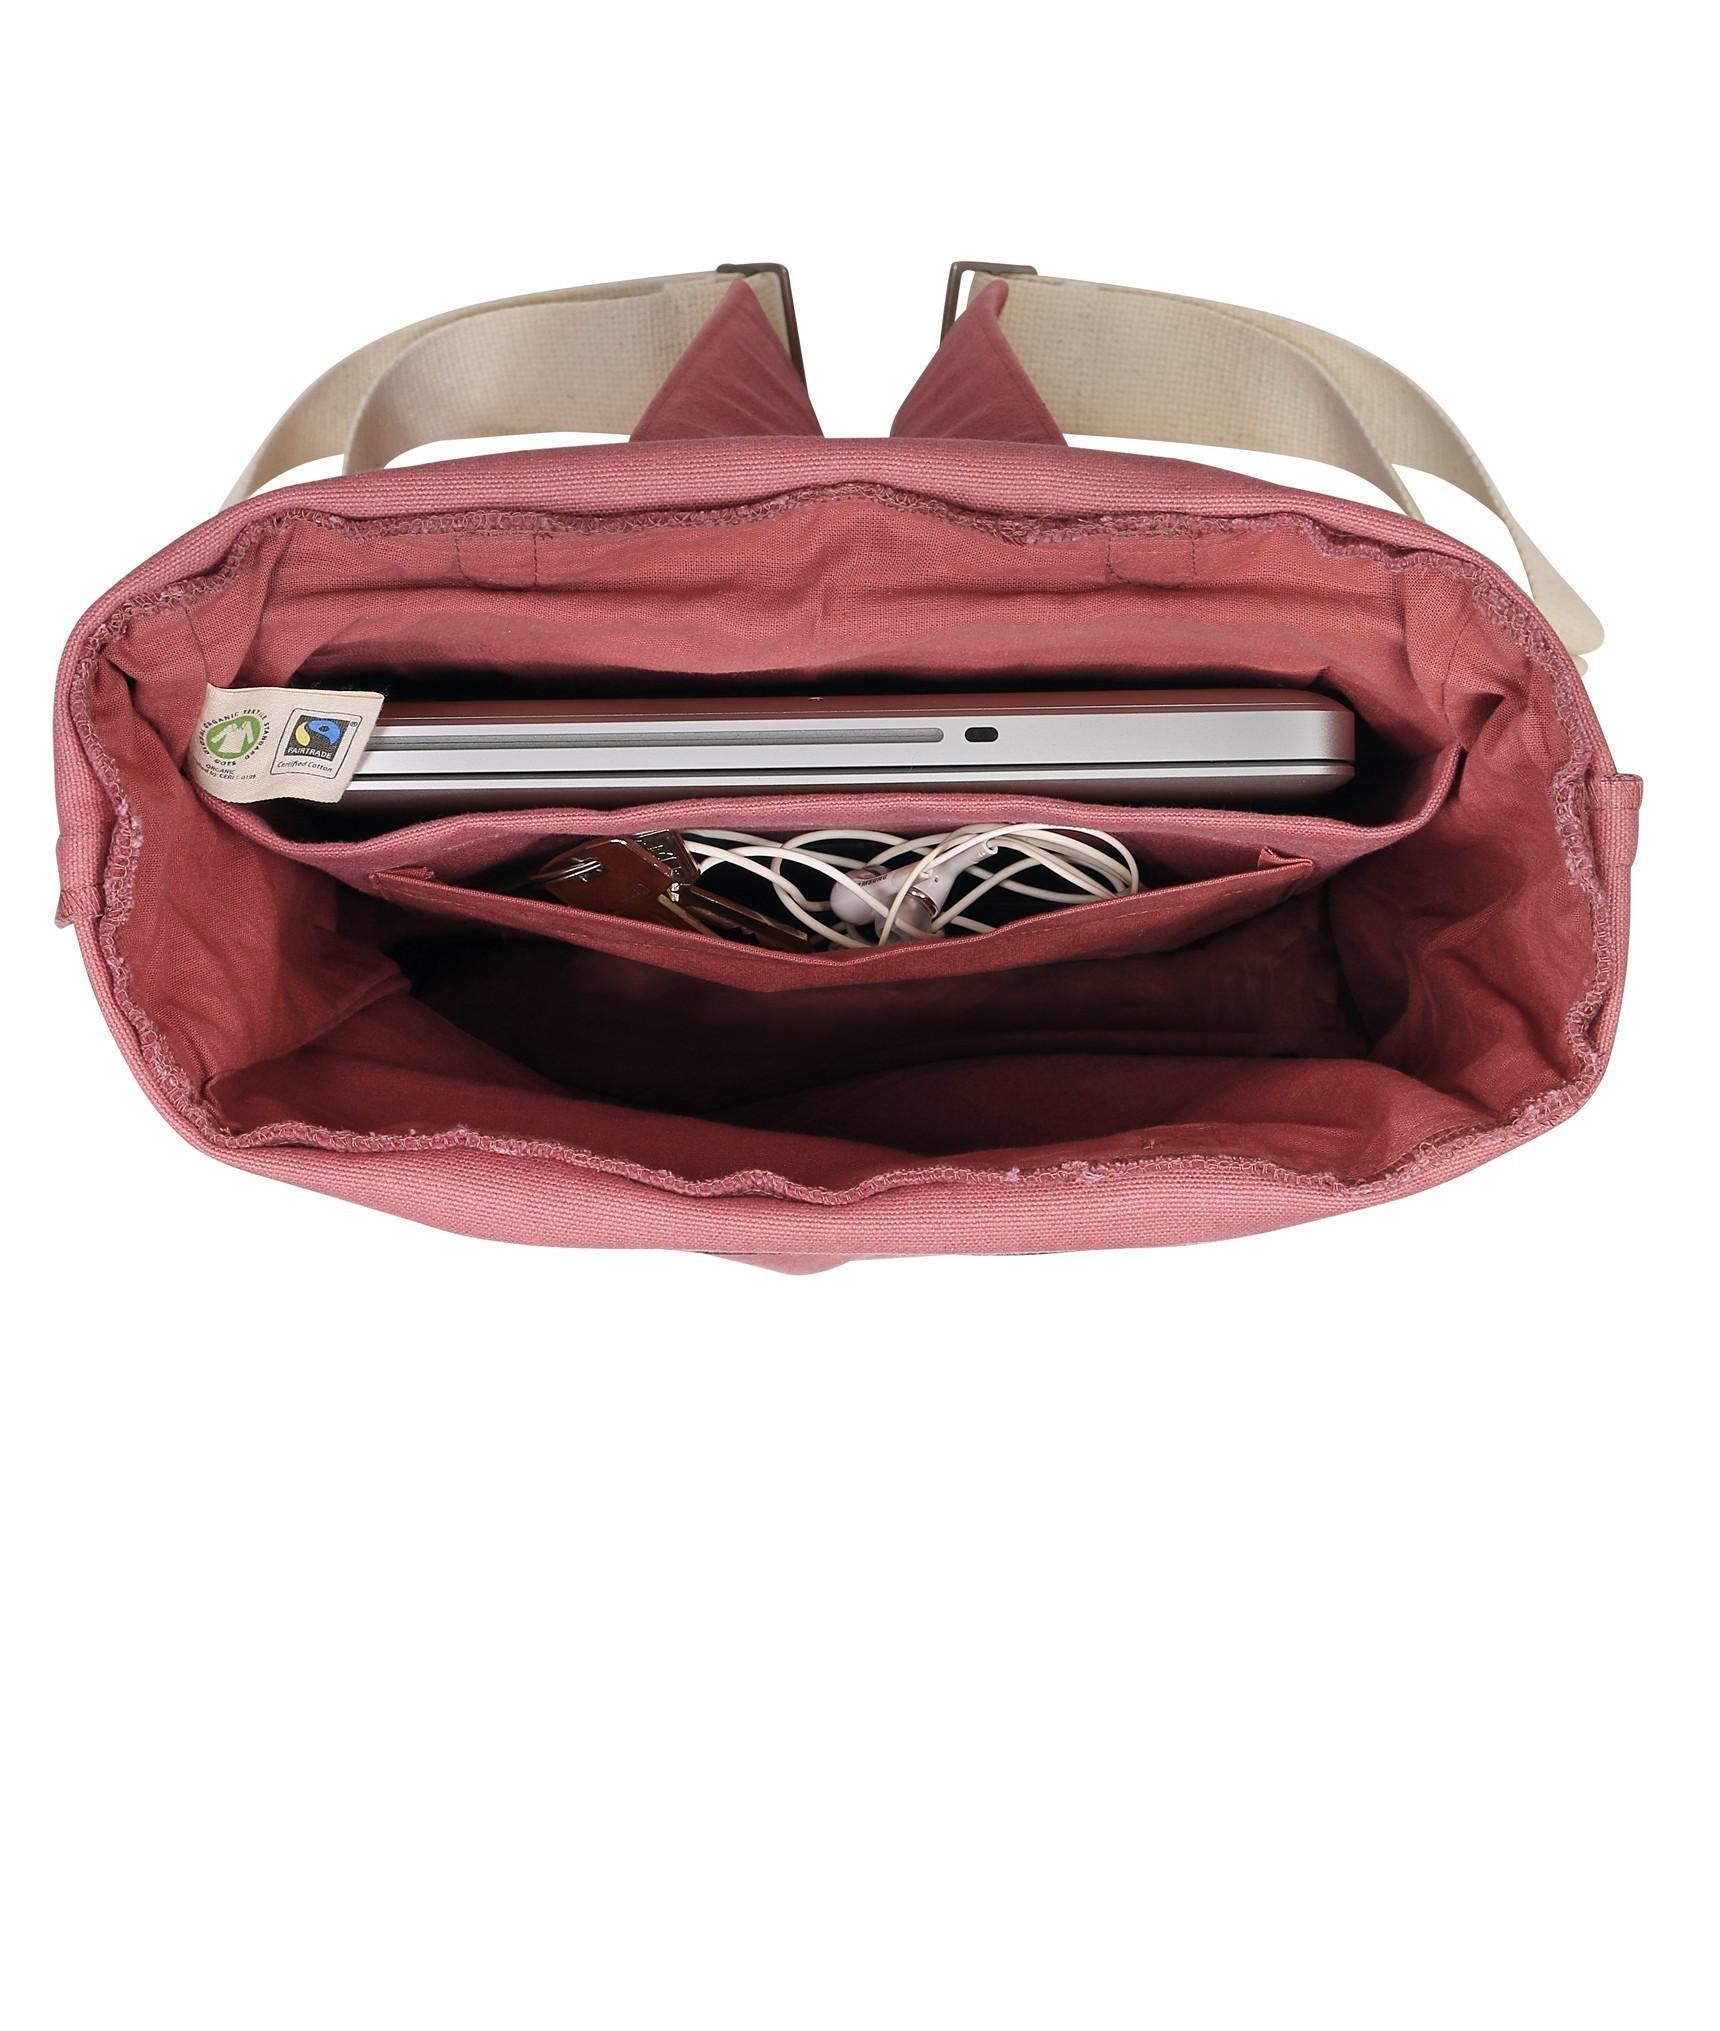 cb5f31c948ba3 MELAWEAR Backpack Ansvar red • Taschen   Rucksäcke Faire Taschen    Rucksäcke bei glore kaufen • glore